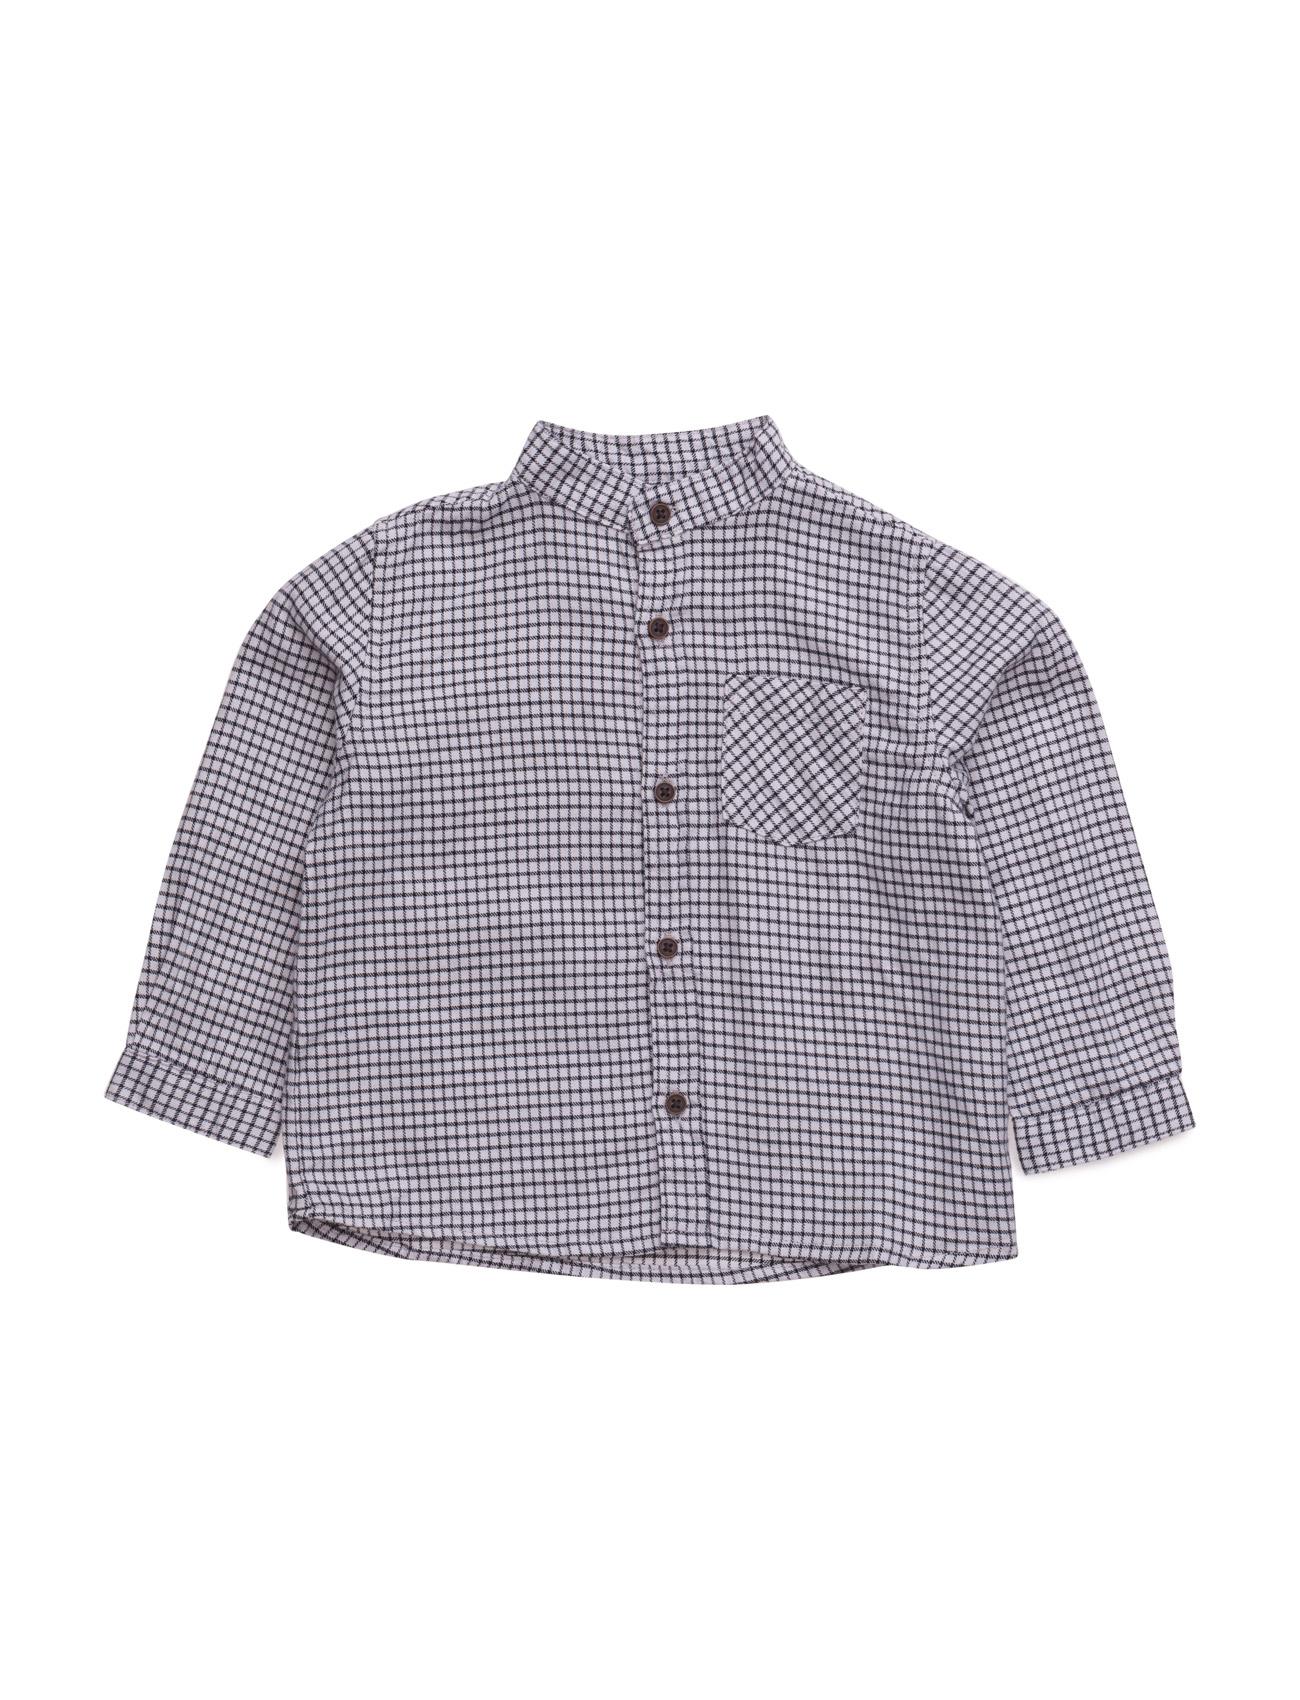 Check Cotton Shirt Mango Kids  til Børn i Grå